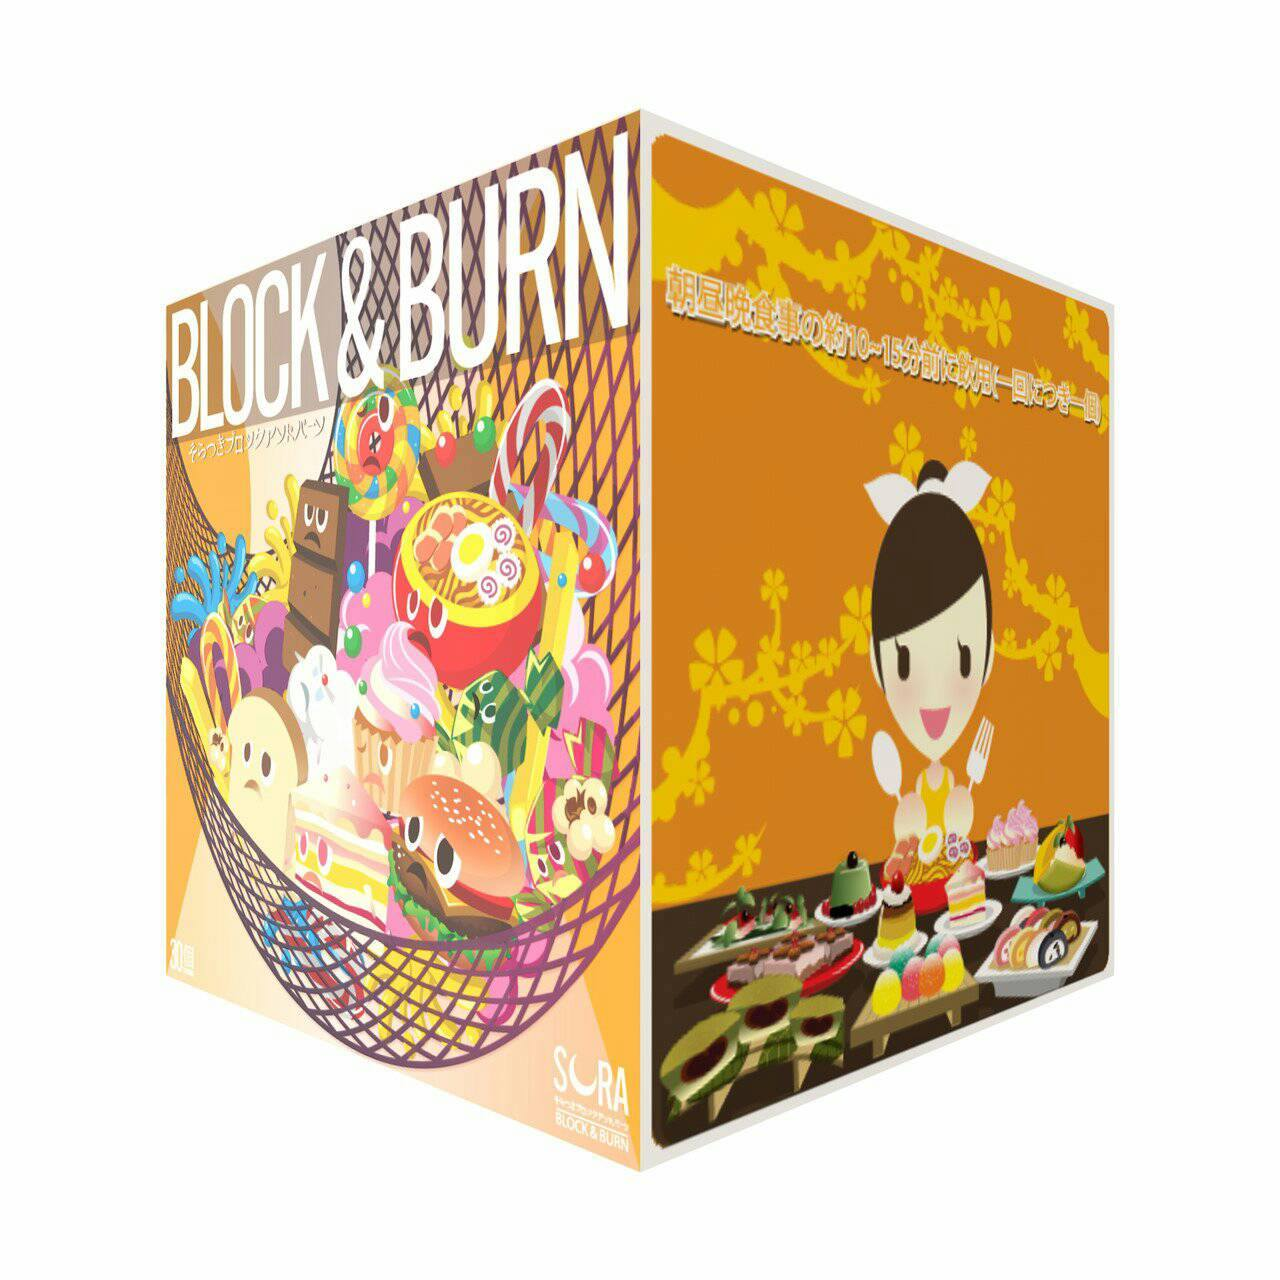 Block & Burn ราคาถูกสุดสุด บล็อกแอนด์เบิร์น รีวิว Jeban